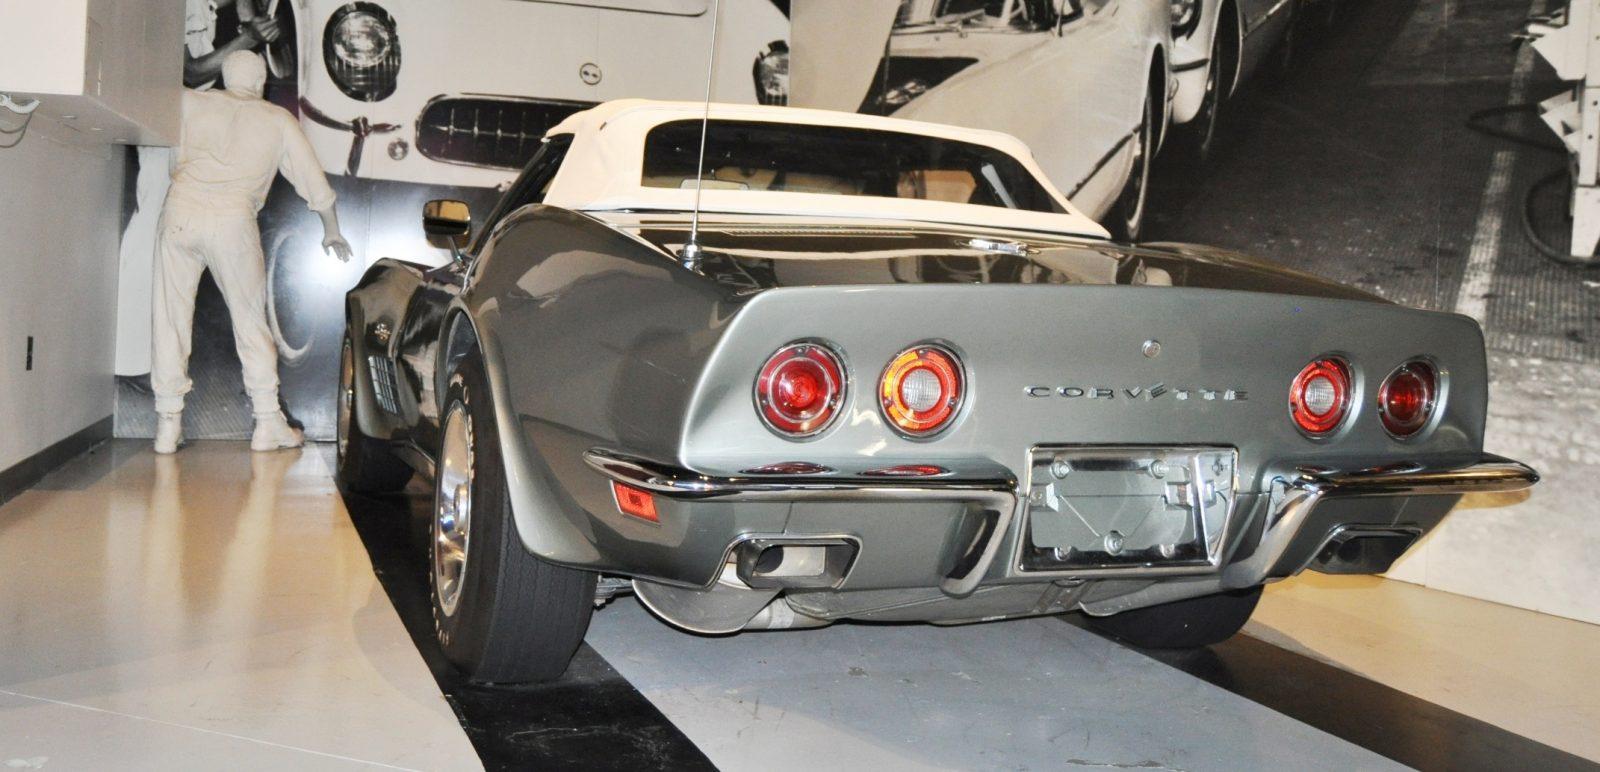 Corvette Museum Photo Tour -- The C1, C2 and C3 Generations in 83 High-Res Photos 83